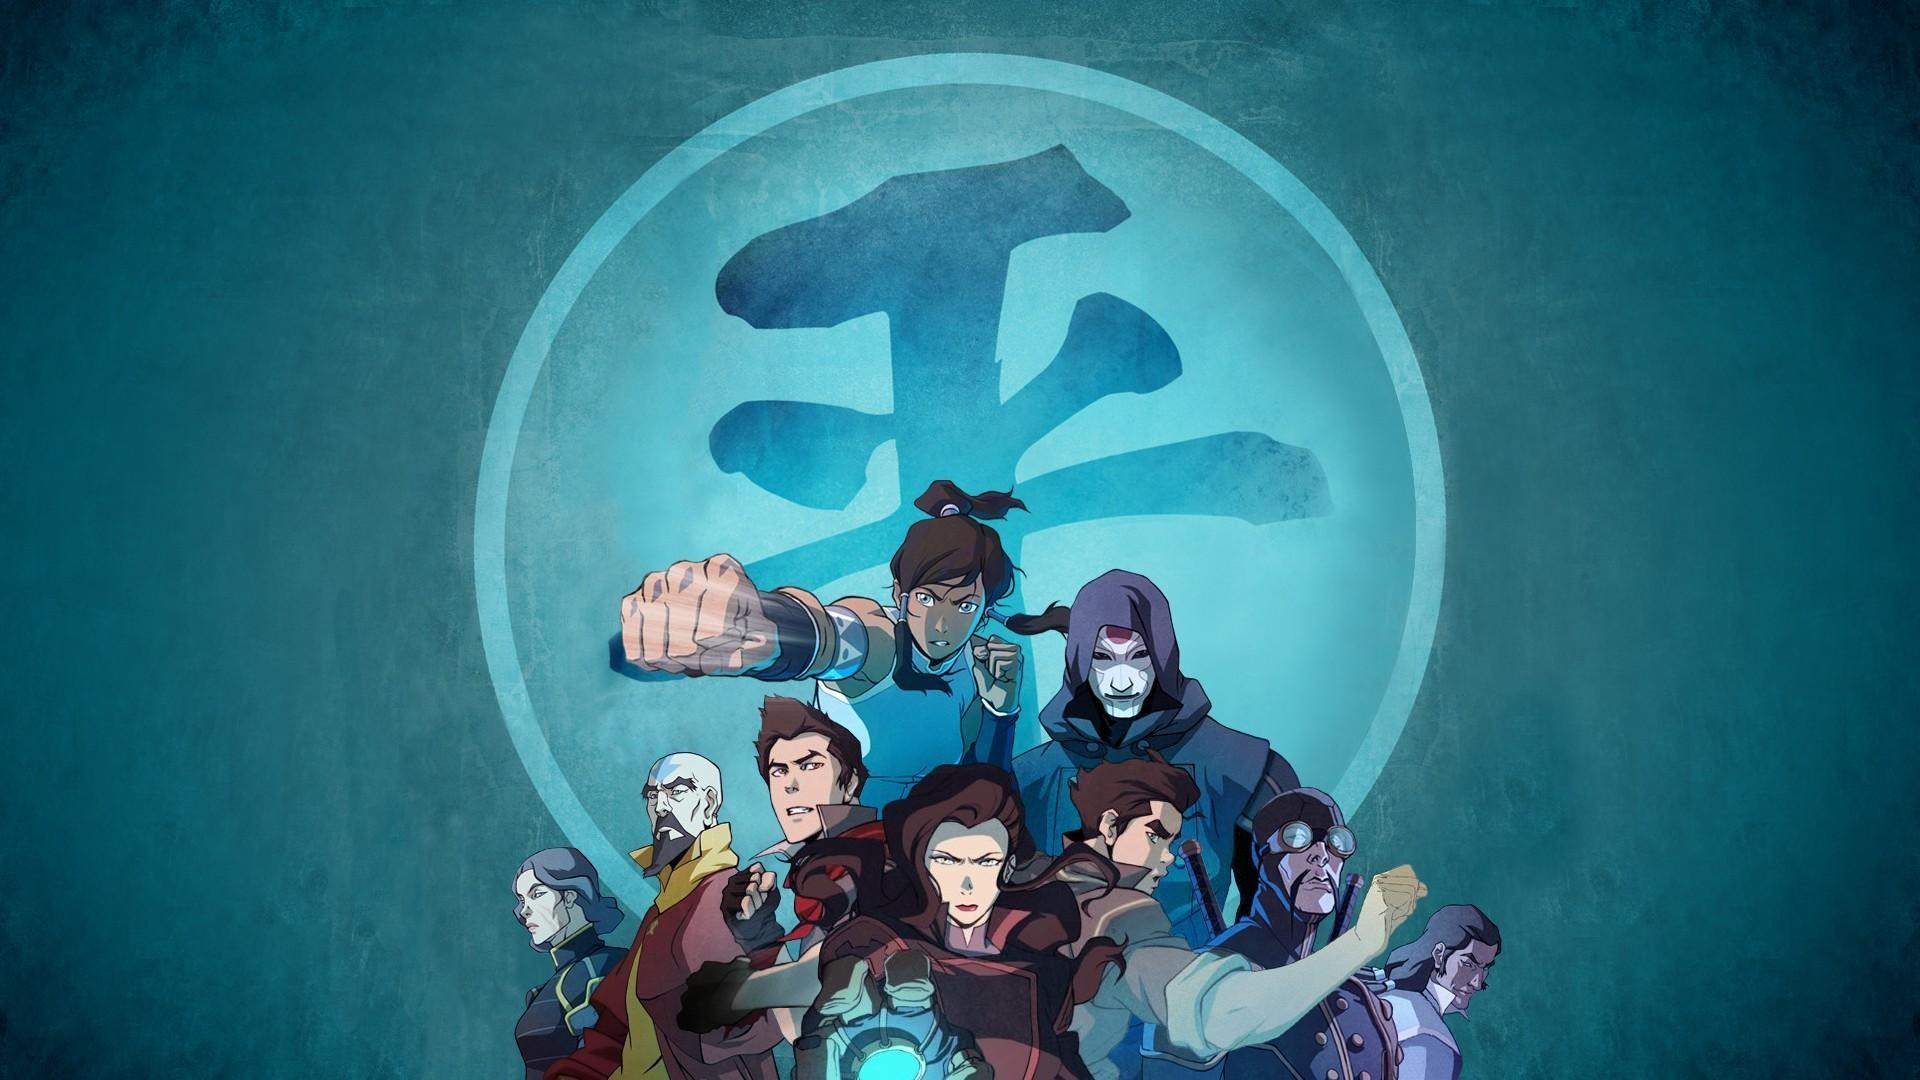 Wallpaper Illustration Blue Underwater The Legend Of Korra